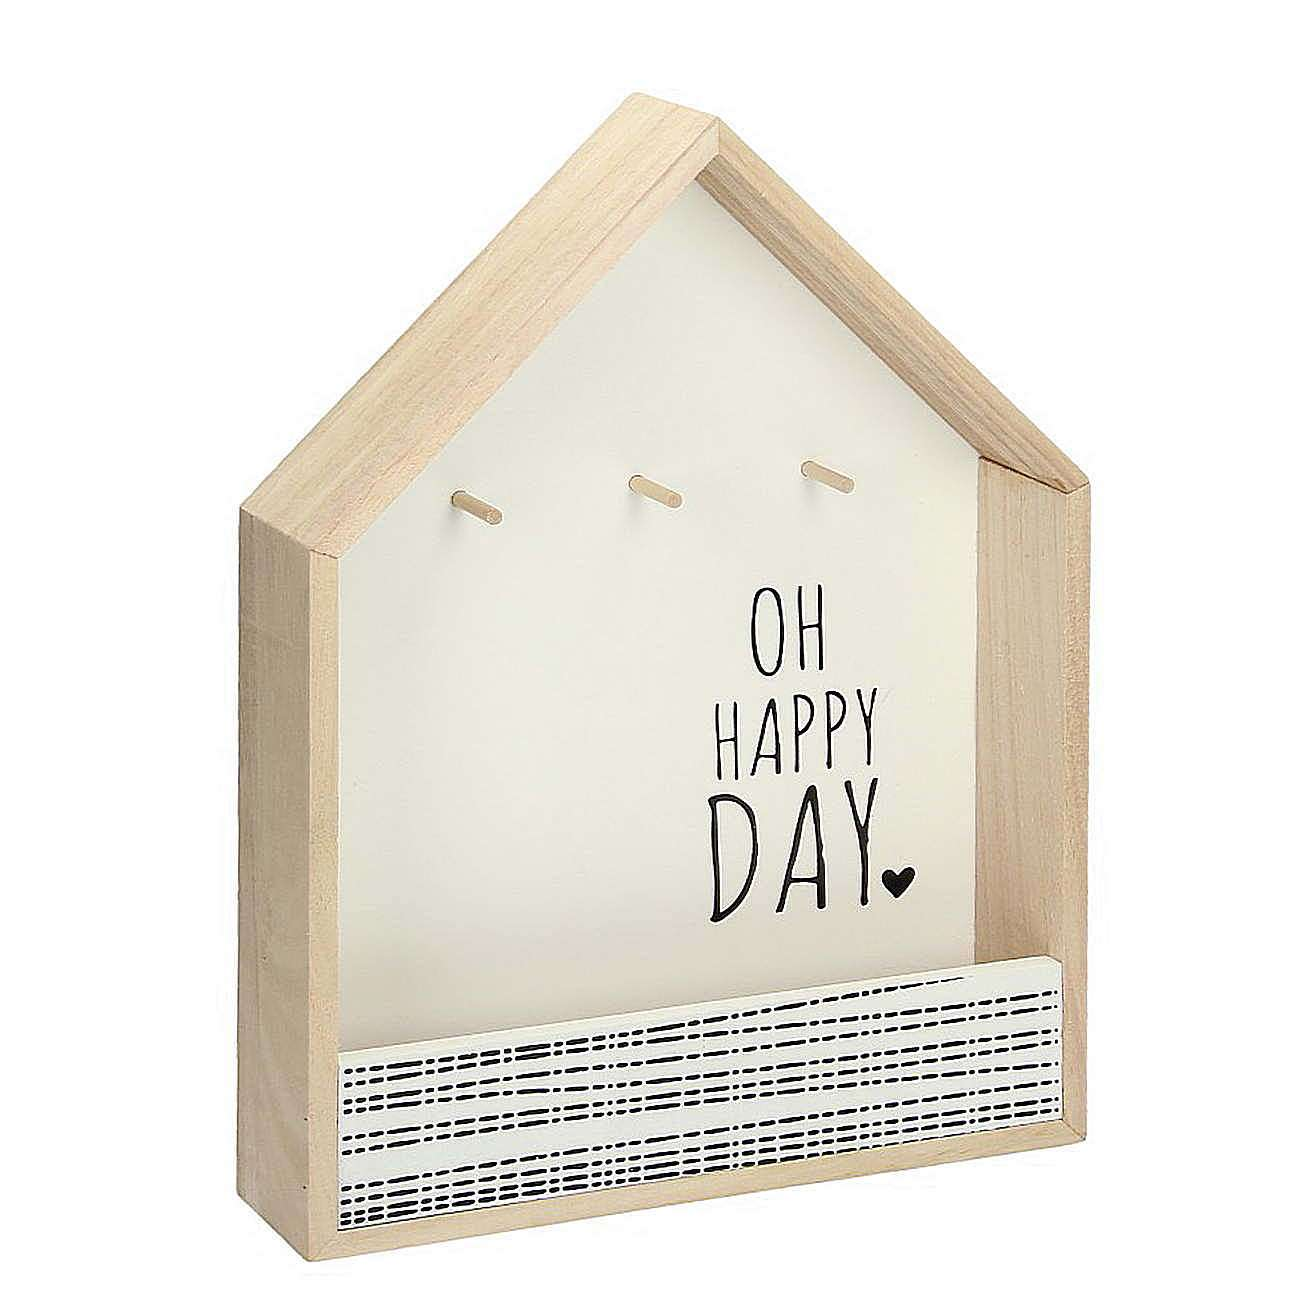 Happy Day hanger